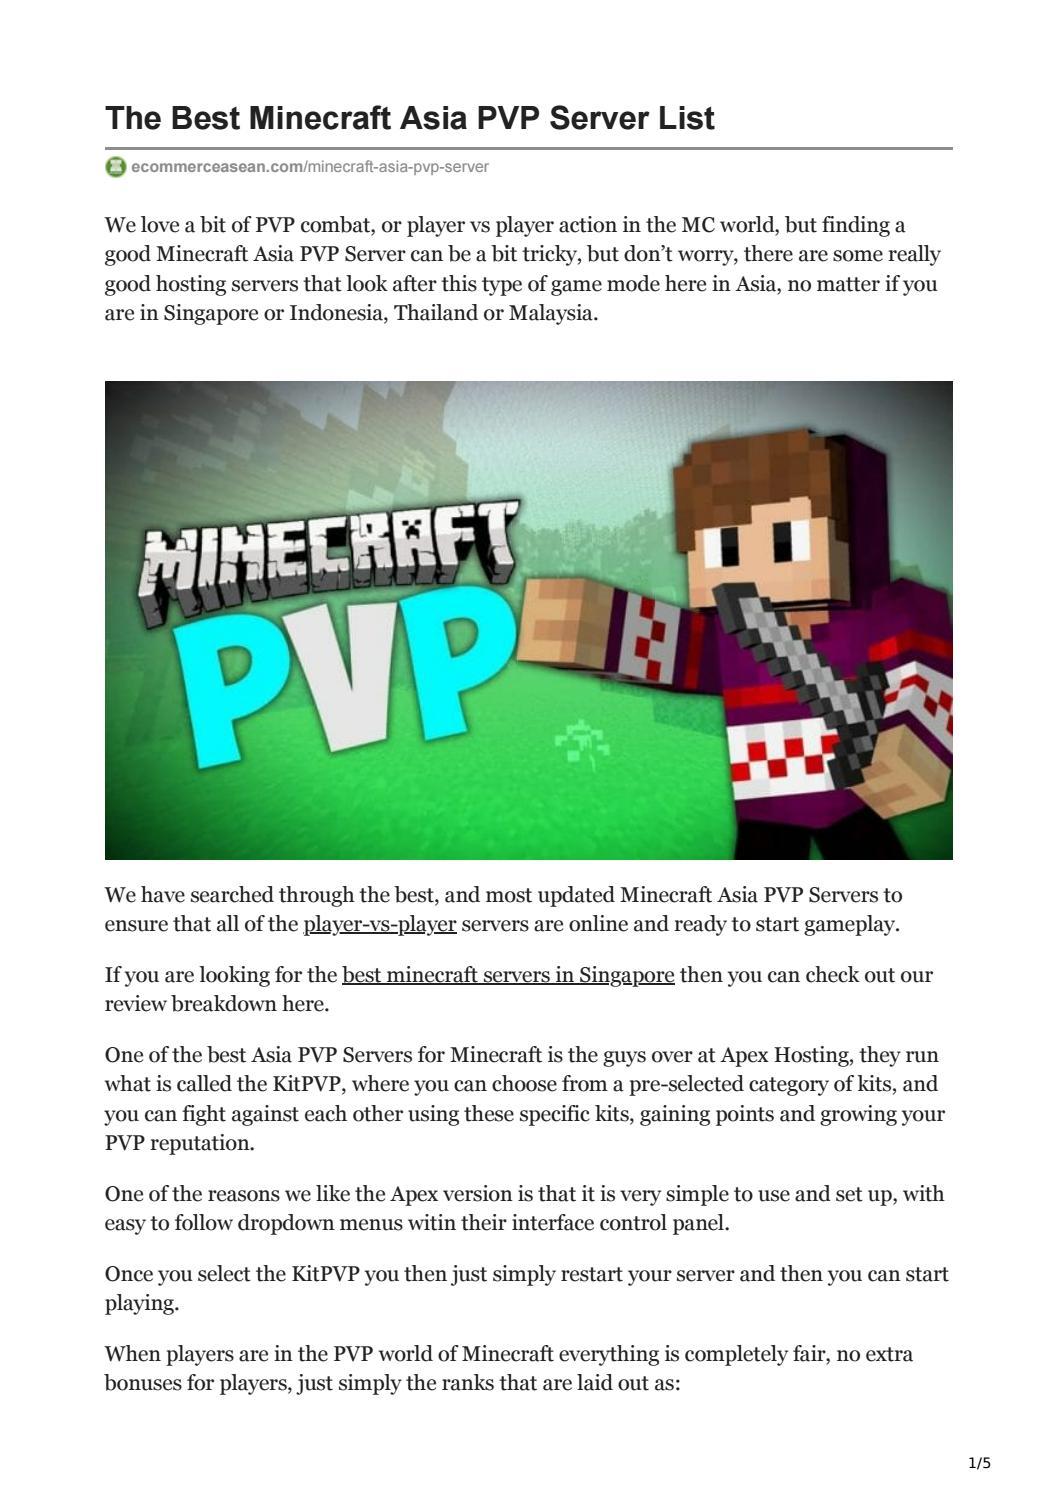 Best Minecraft Asia PVP Server List 2021 by eASEAN issuu